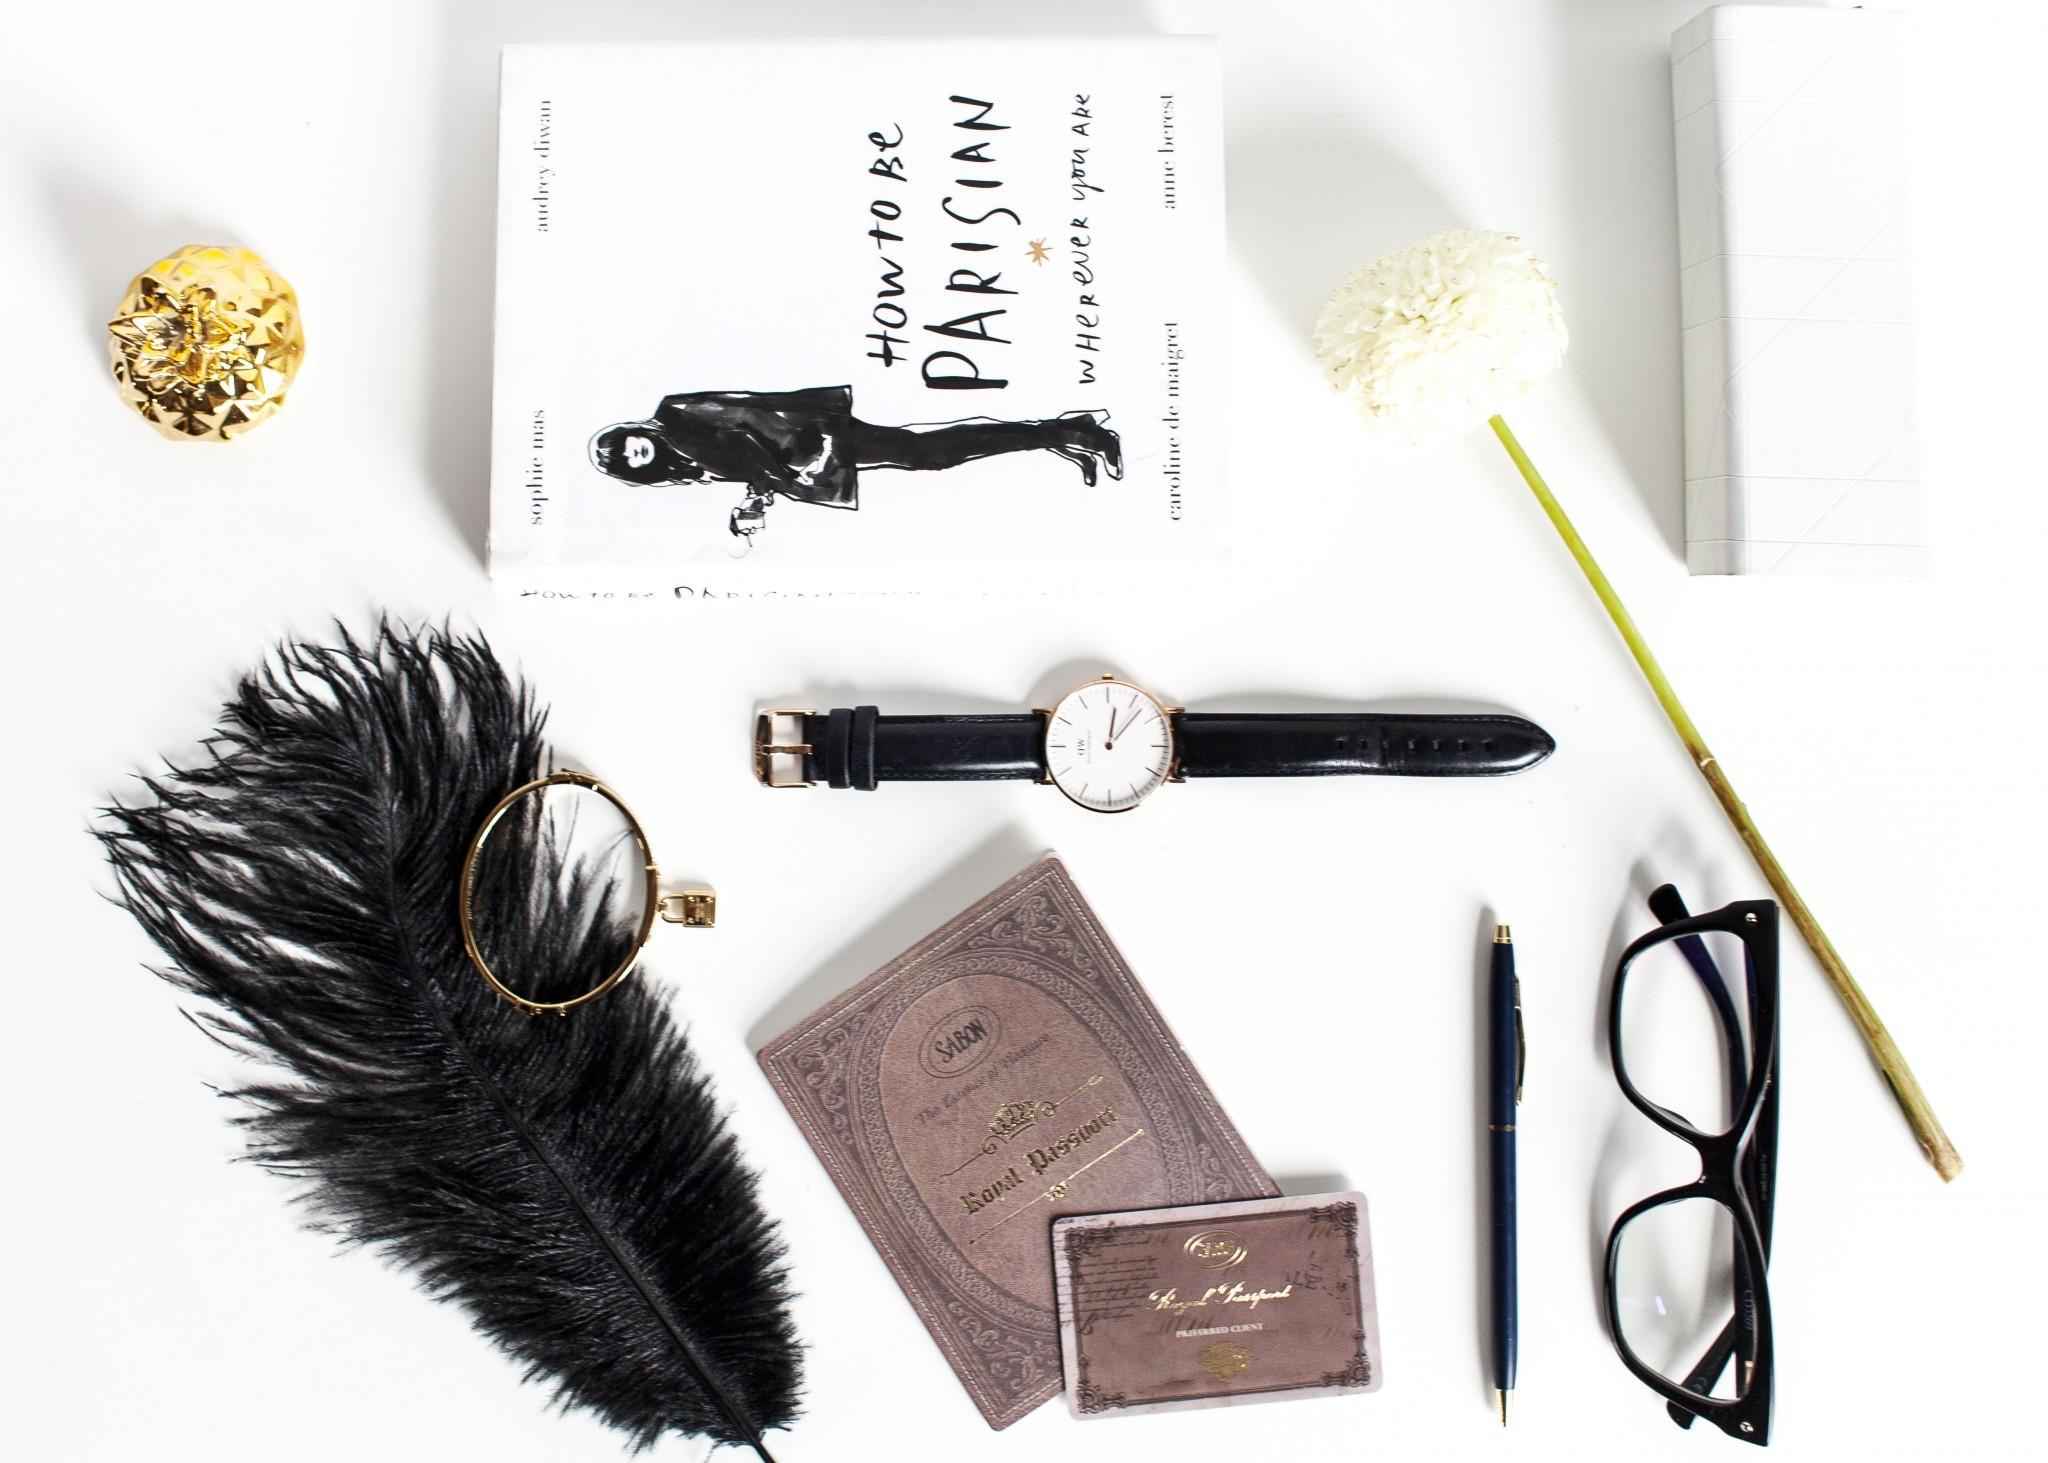 0sabon_royal_passport_fabulous_muses_fabuloasele_topcosmetice